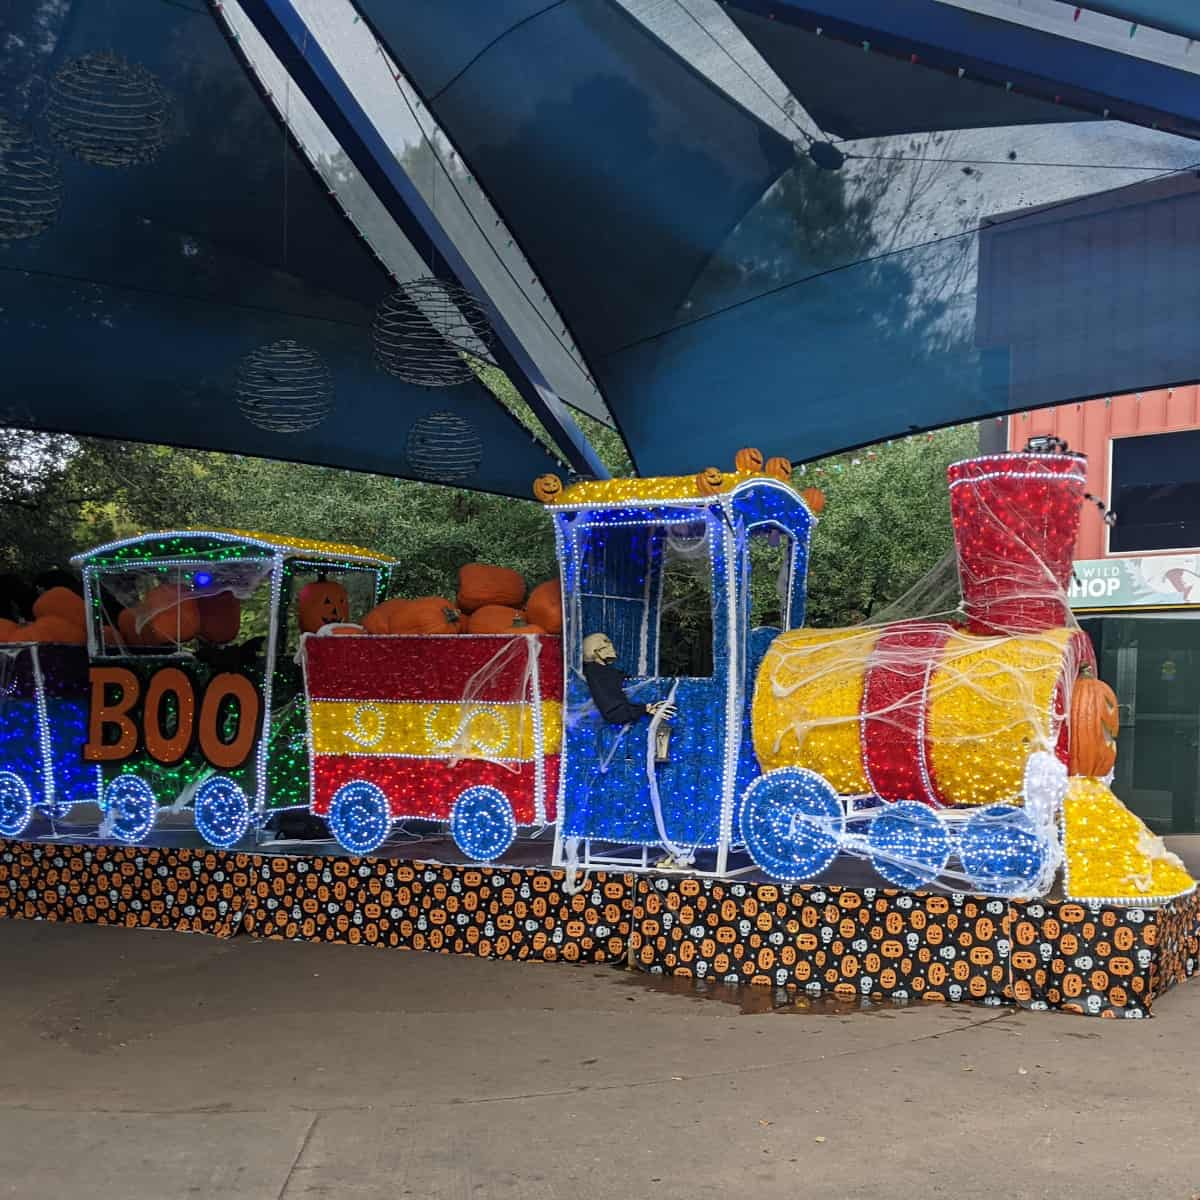 Houston Zoo Zoo Boo Spooky Train